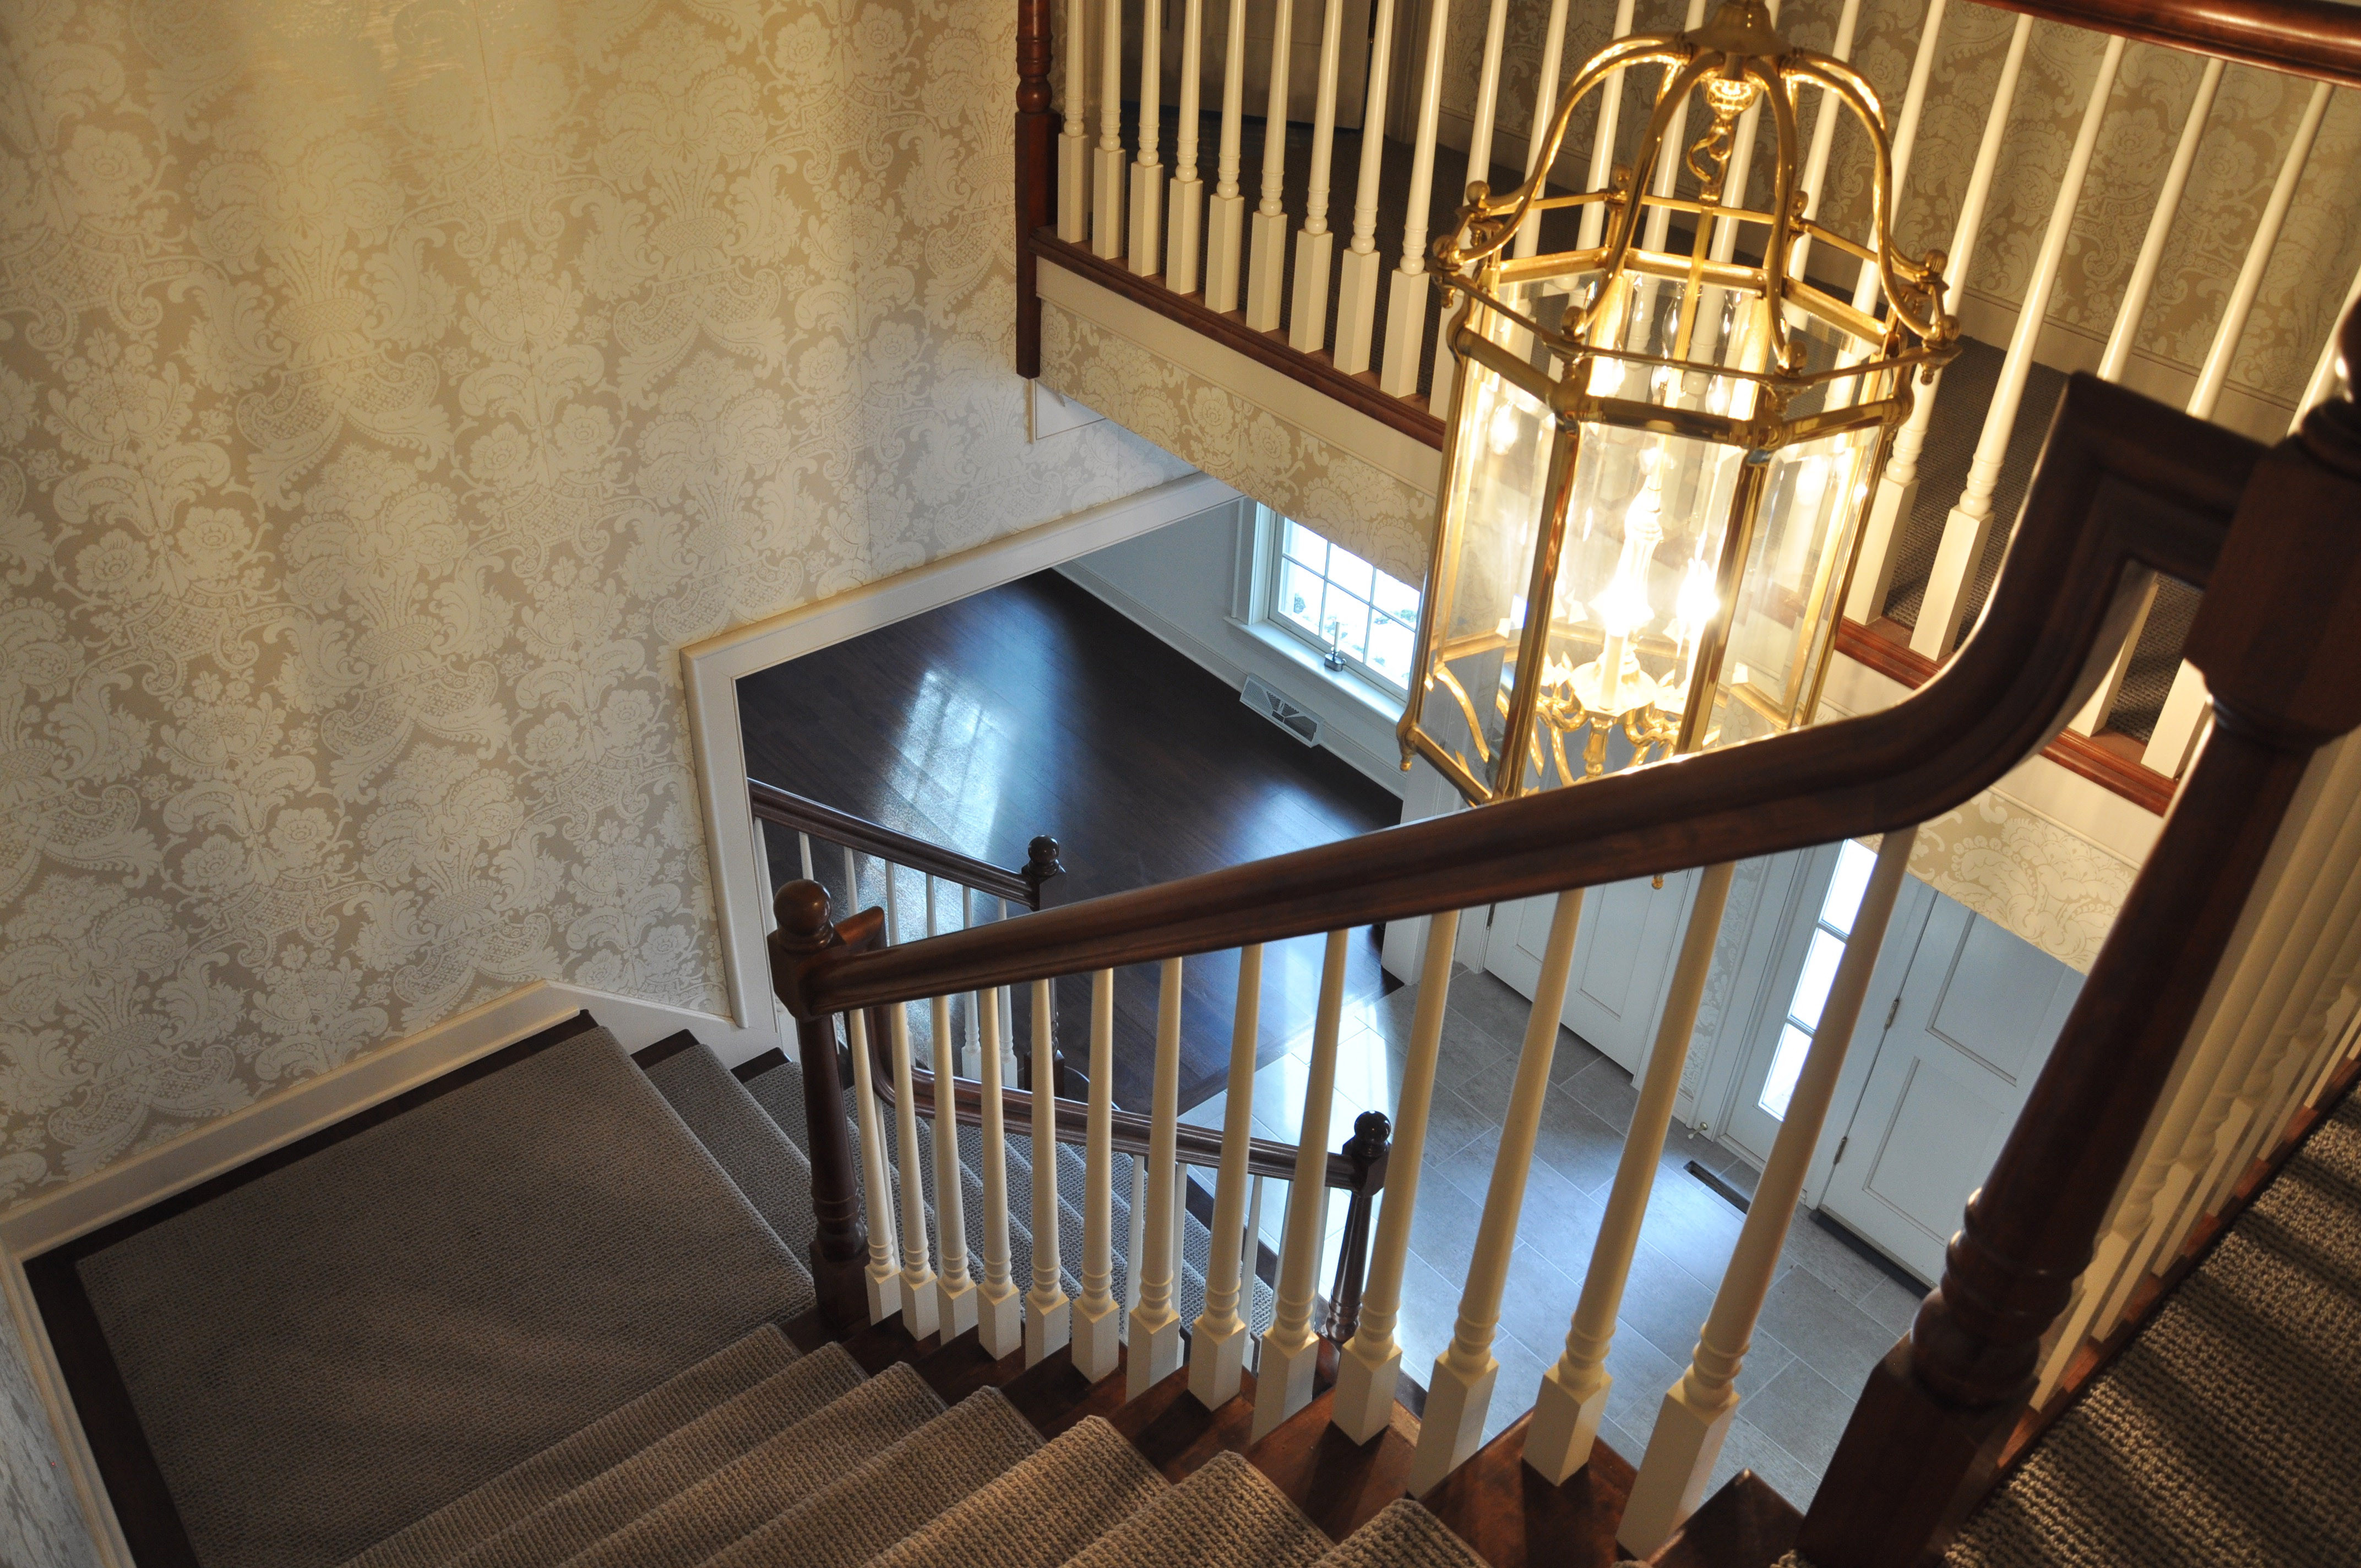 hardwood floor refinishing waukesha of hardwood stair treads staircasing installation milwaukee wi throughout click image to enlarge